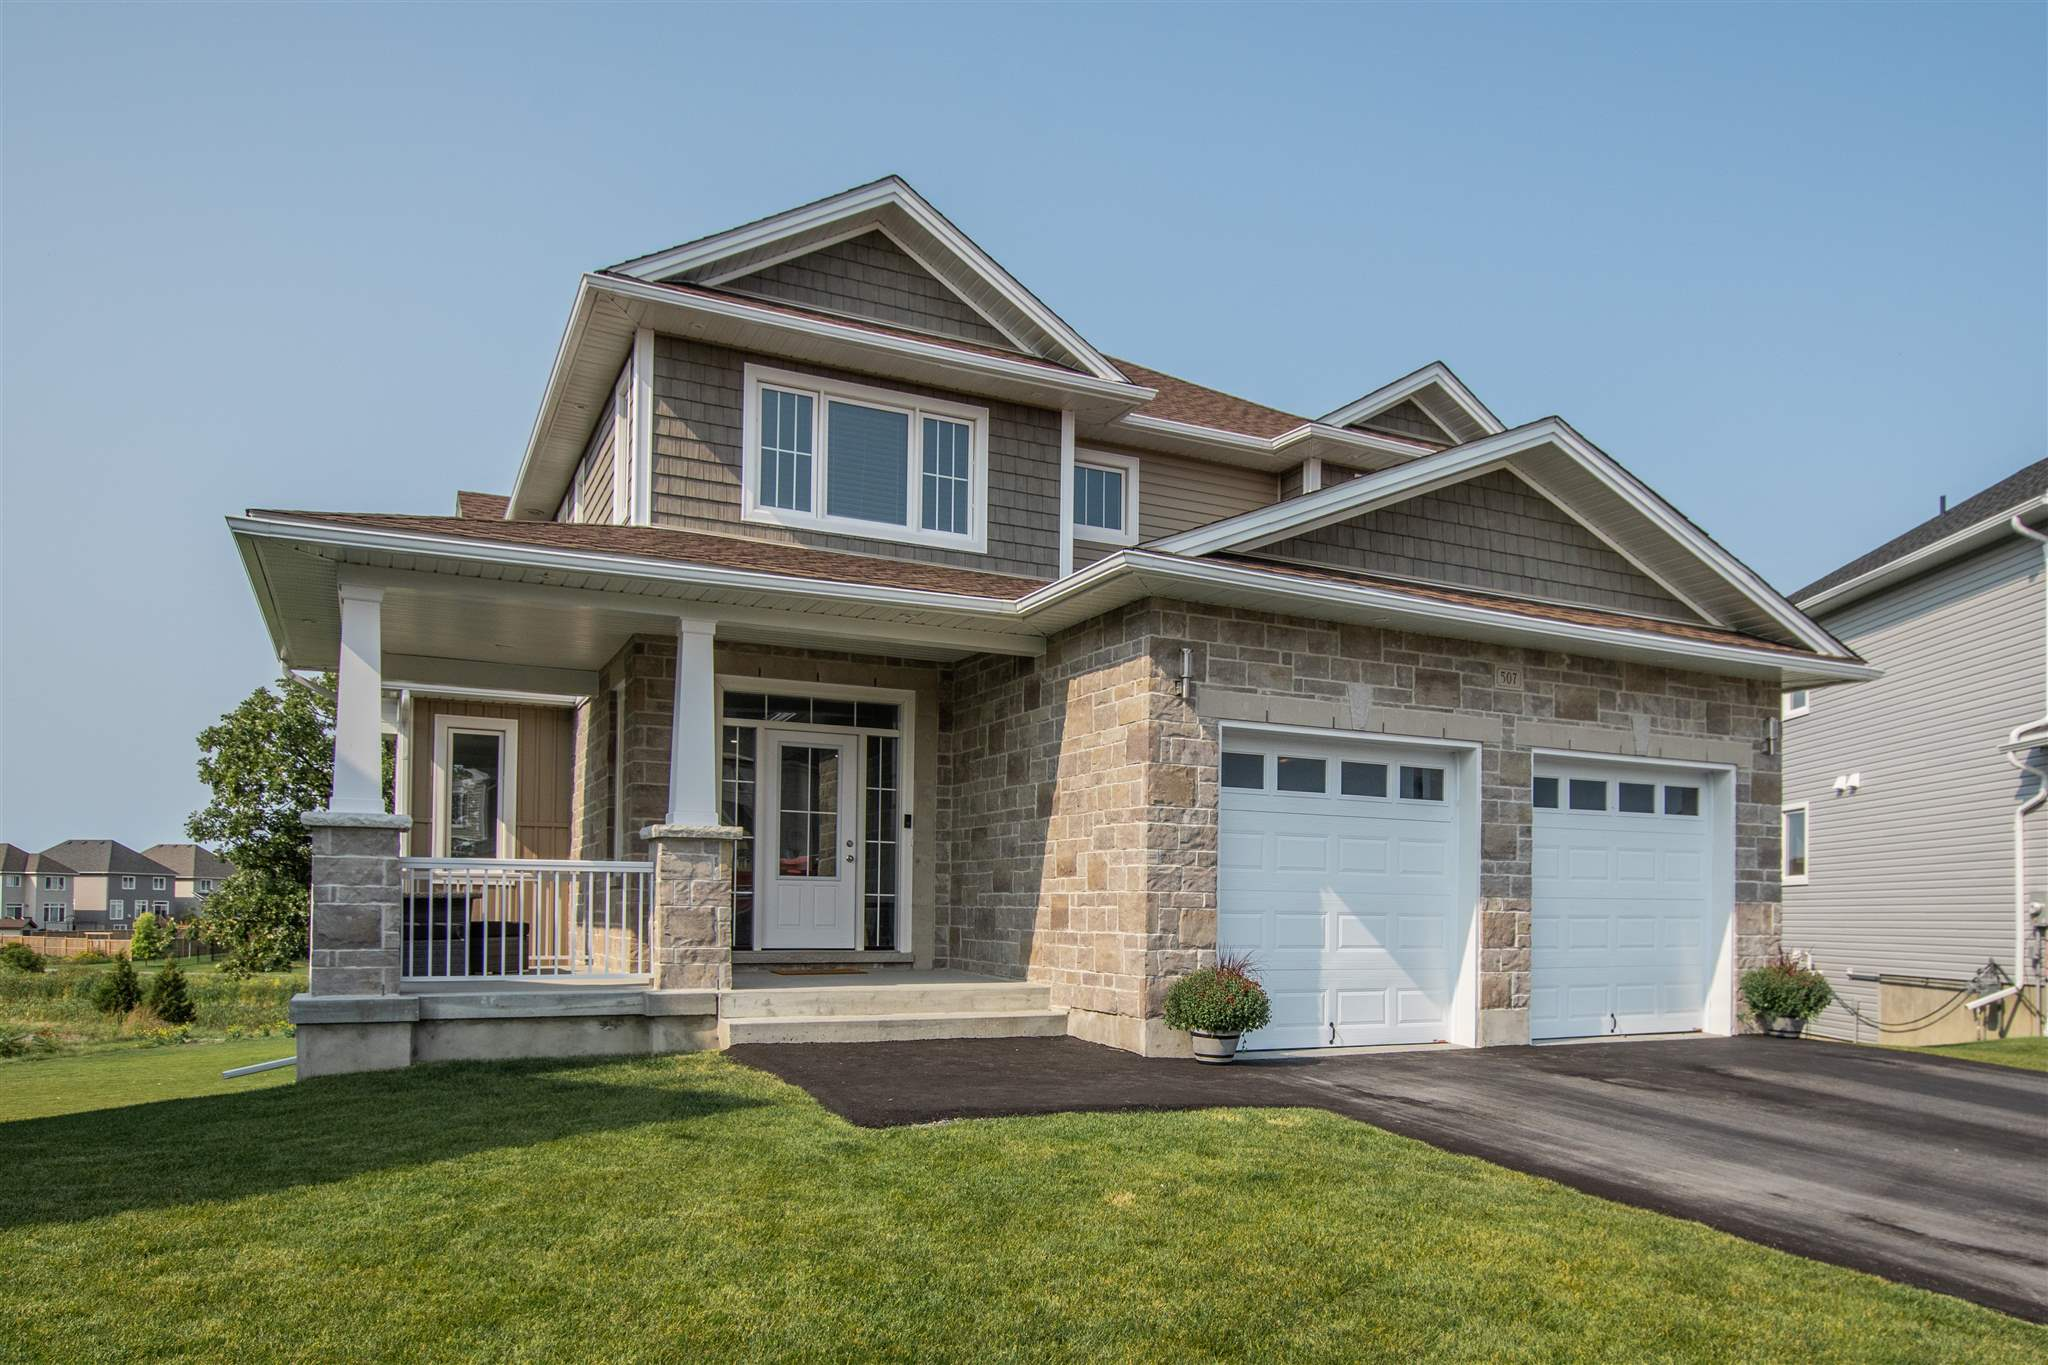 507 Beth Crescent, Kingston Ontario, Canada